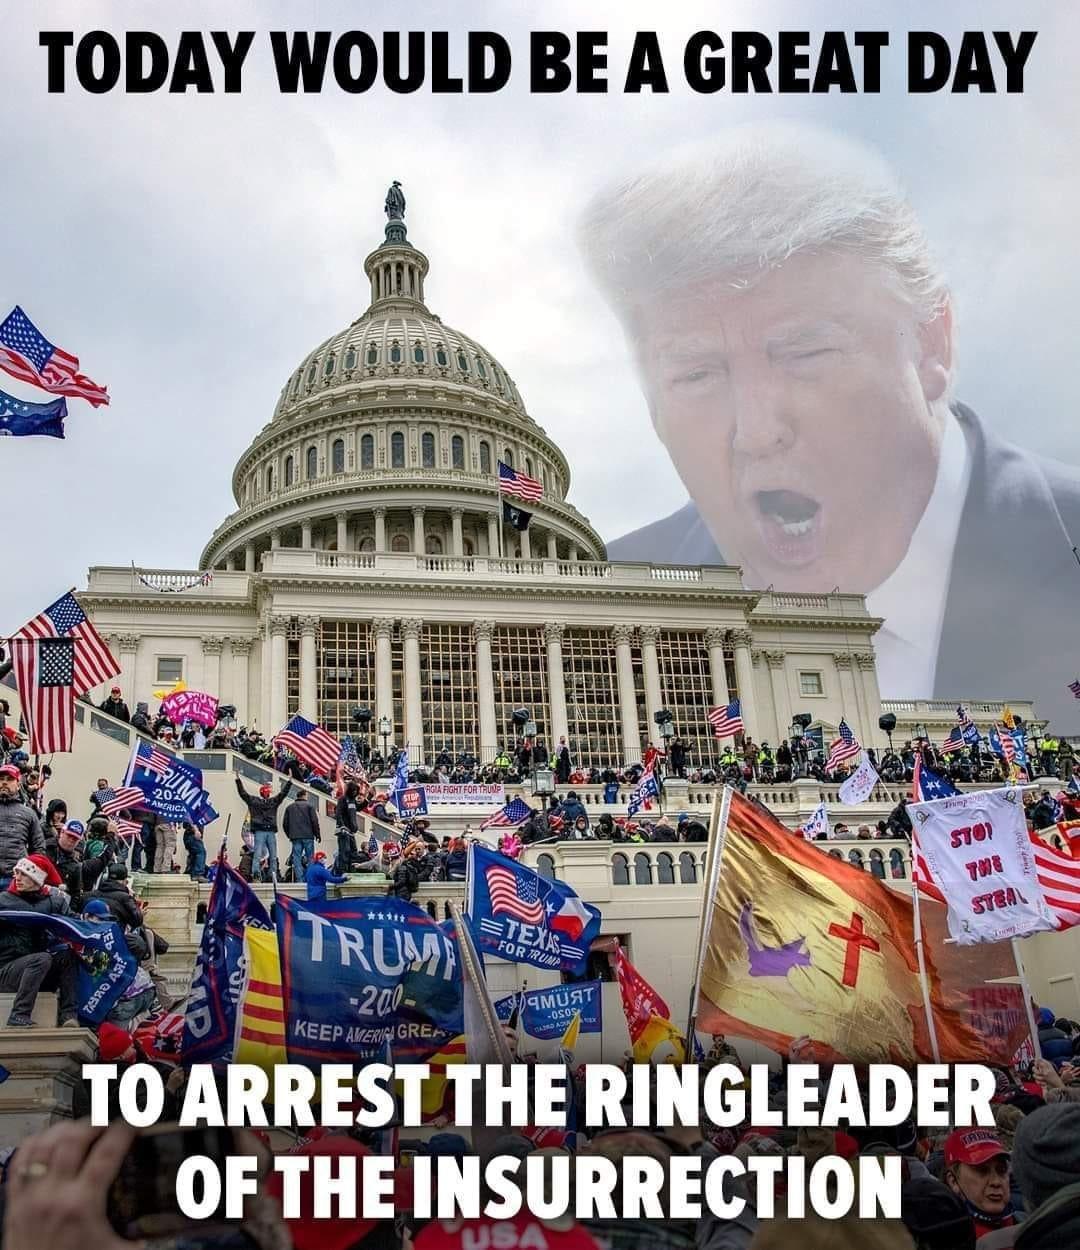 Memes Donald Trump ringleader of the insurrection